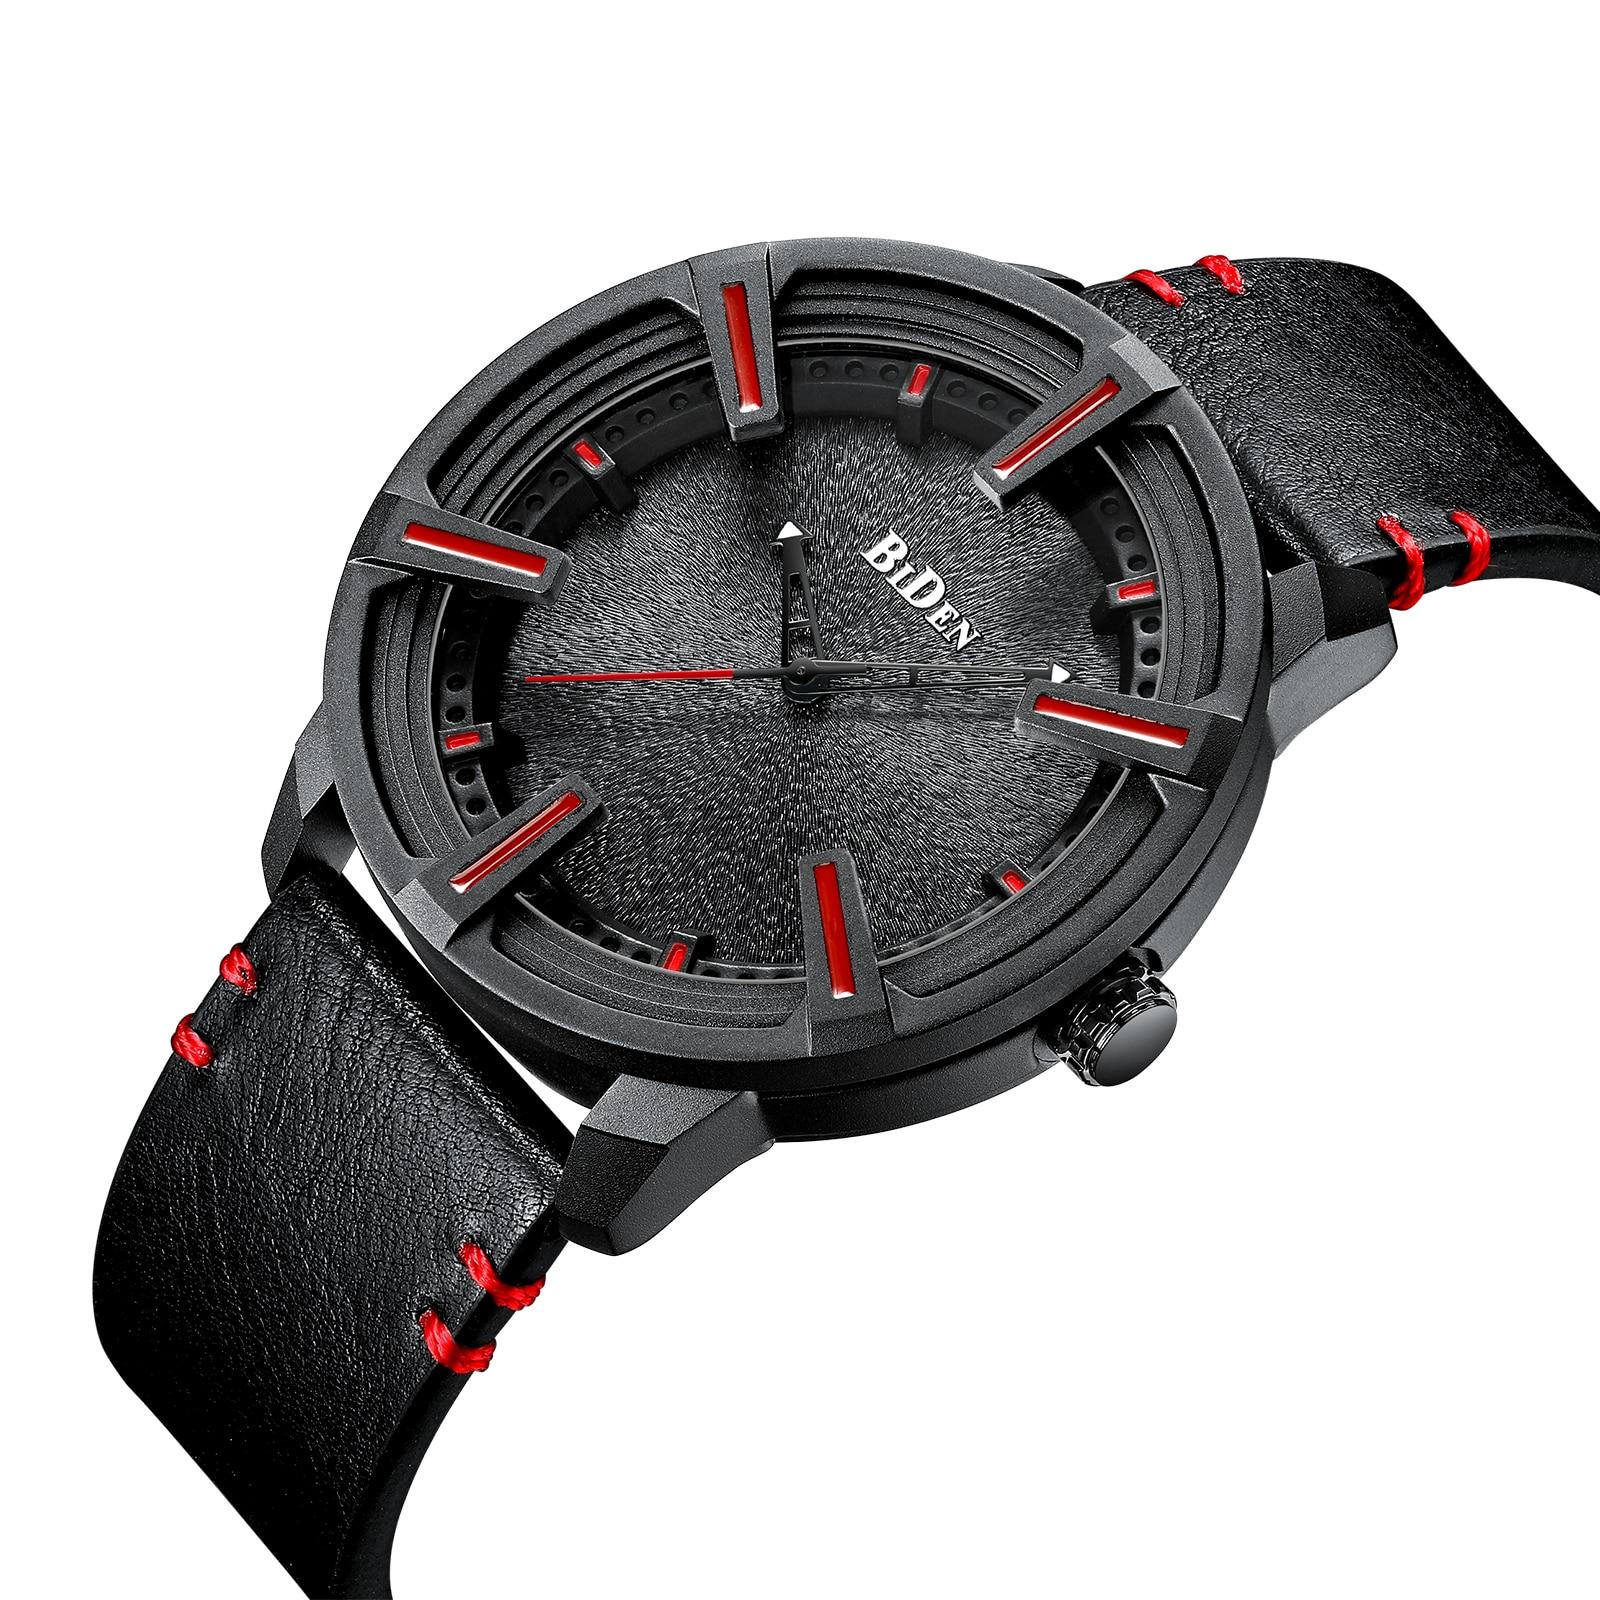 BIDEN Top Brand Watches Mens 2019 Orologio Uomo Black Leather Strap Casual Waterproof High Quality Relogio Masculino Man Clocks